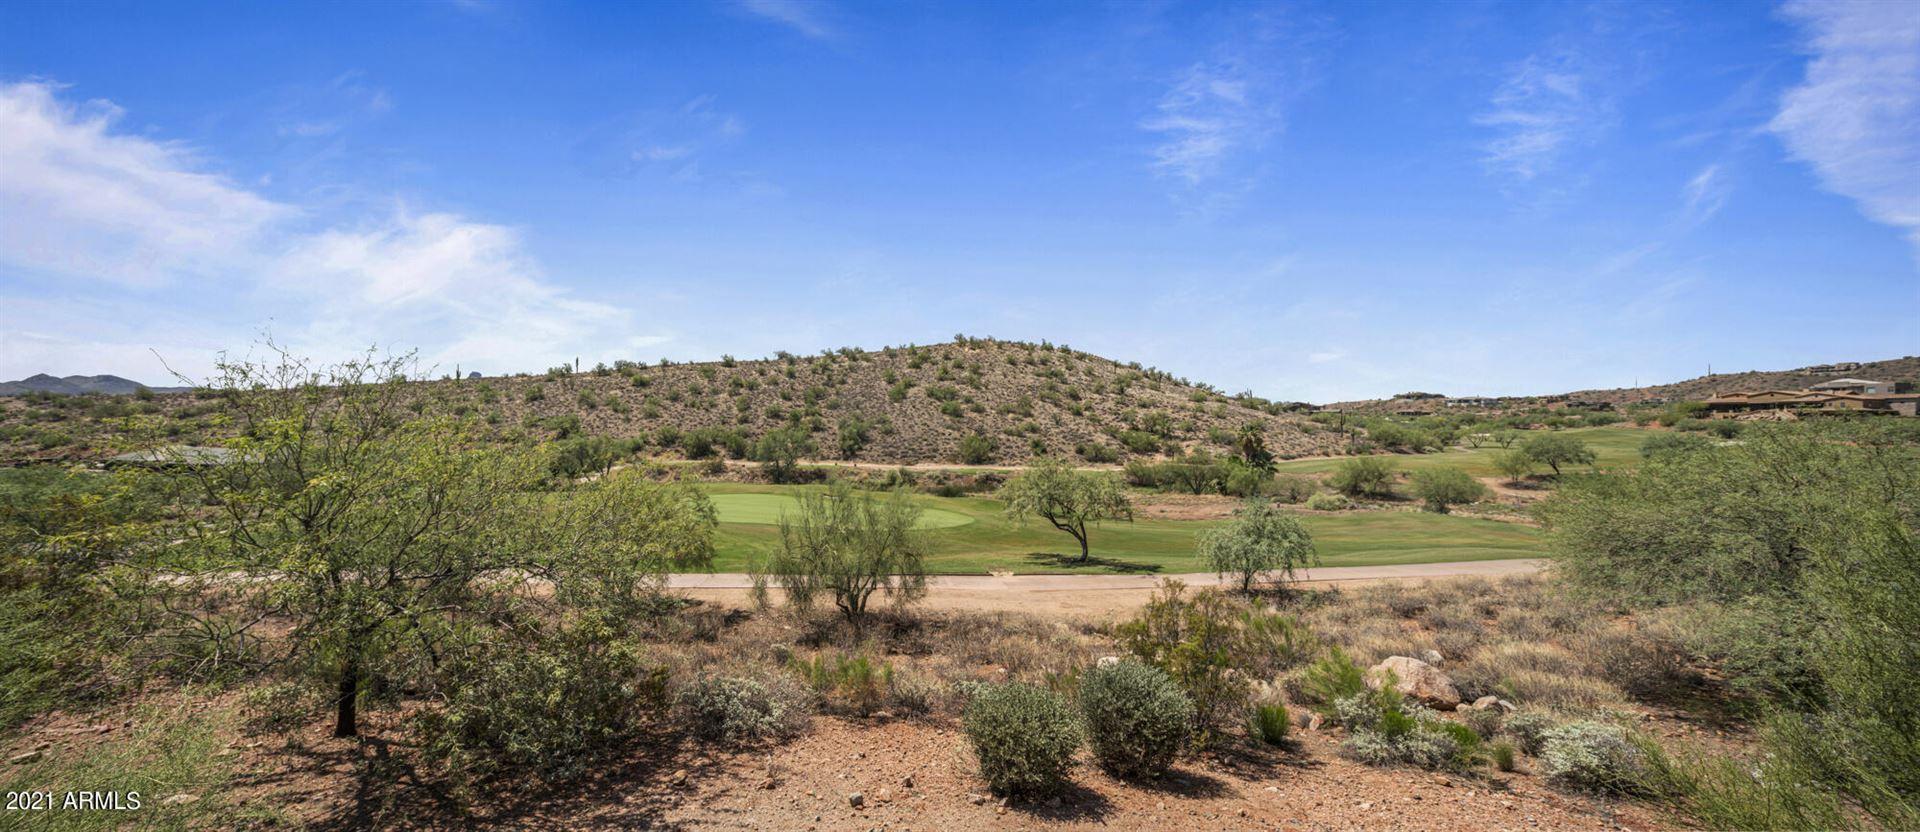 Photo of 16349 E LINKS Drive, Fountain Hills, AZ 85268 (MLS # 6270941)